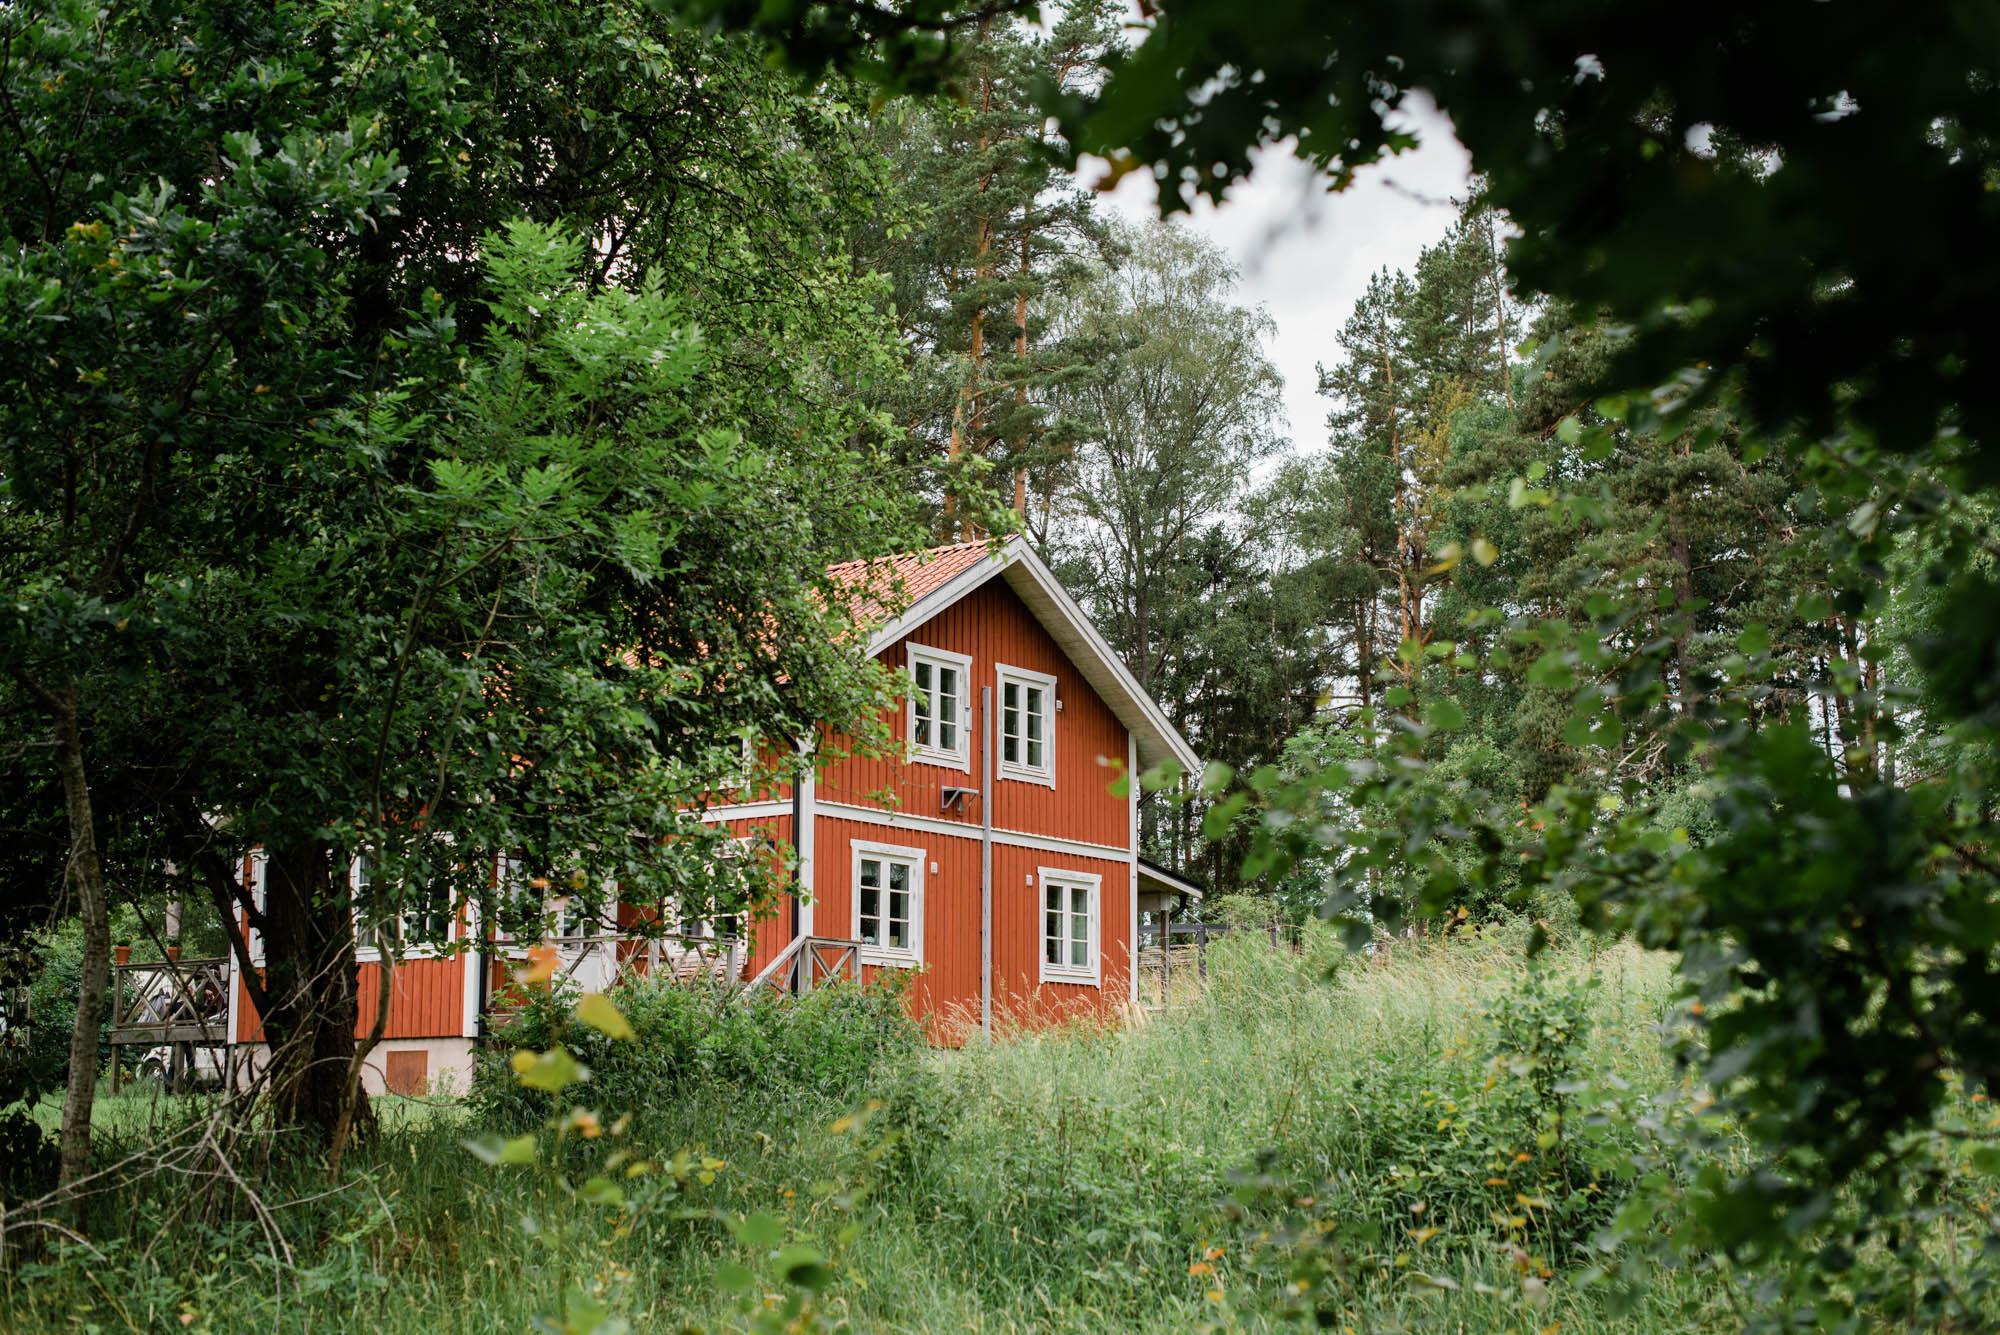 Web-hannah puechmarin-sweden-8820.jpg